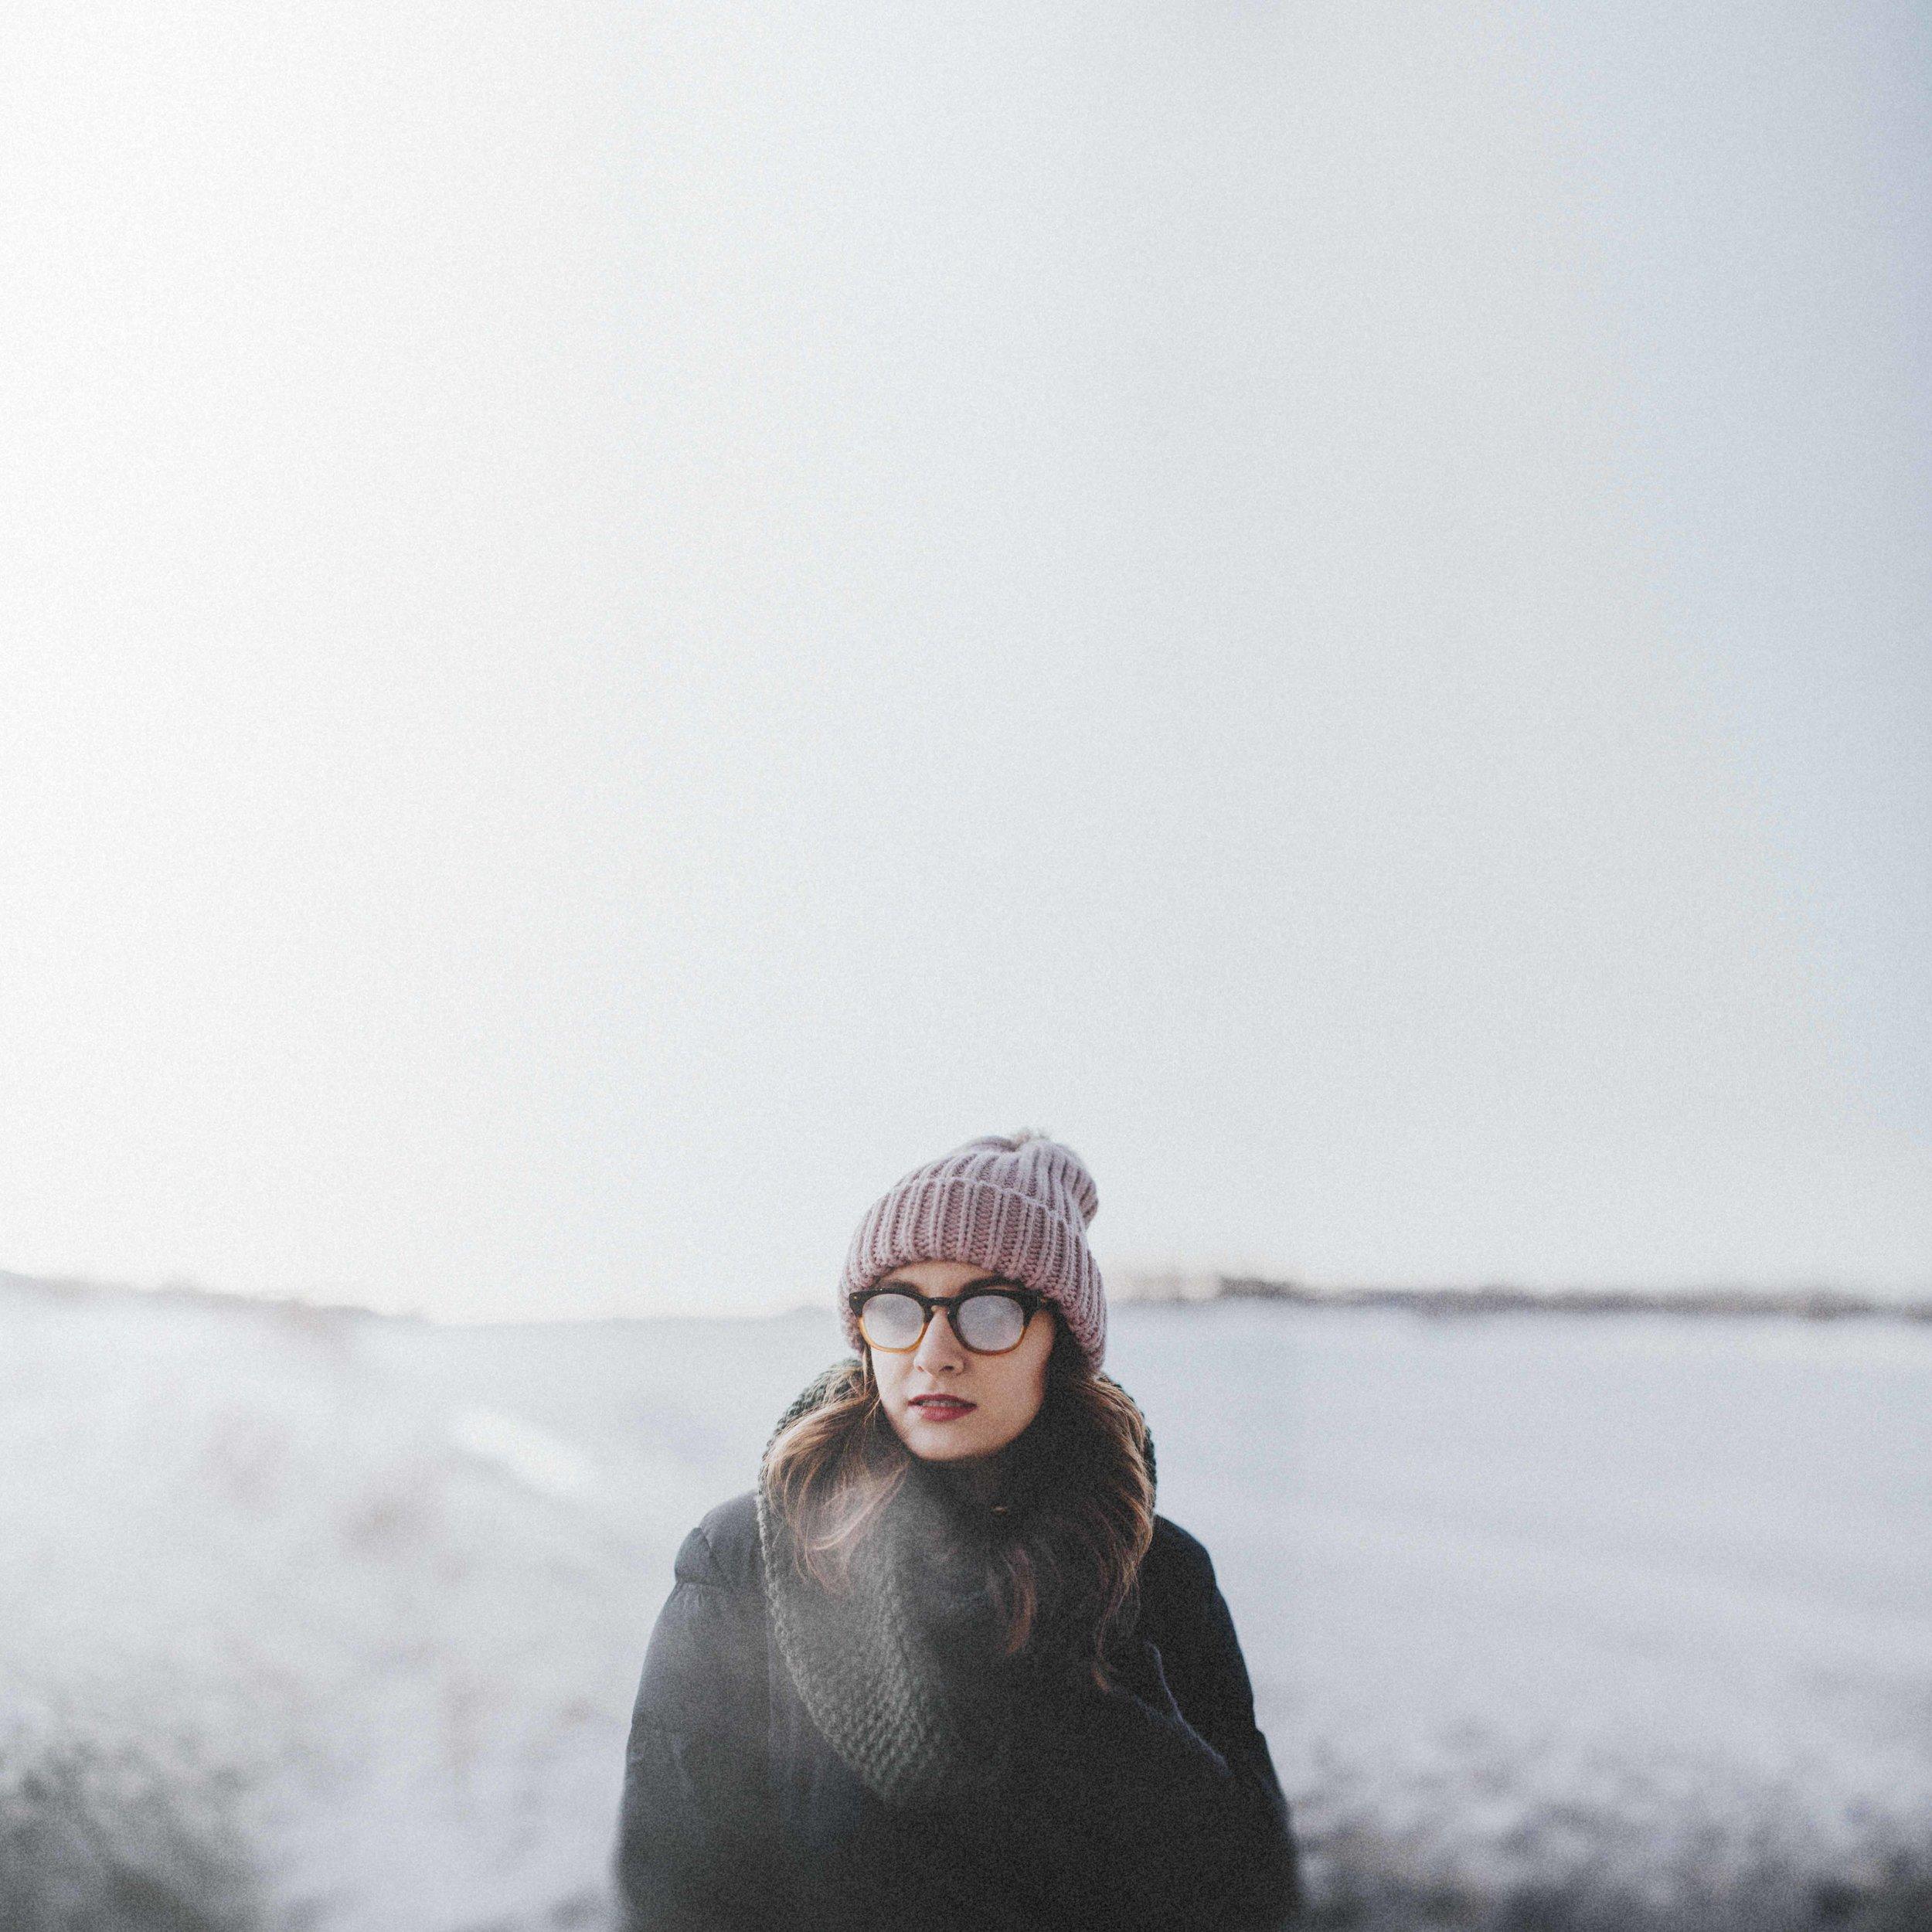 60. (Week 84 part 2) Annitsa Sprynczynatyk | Effluvium [January 2017]-b&w.jpg